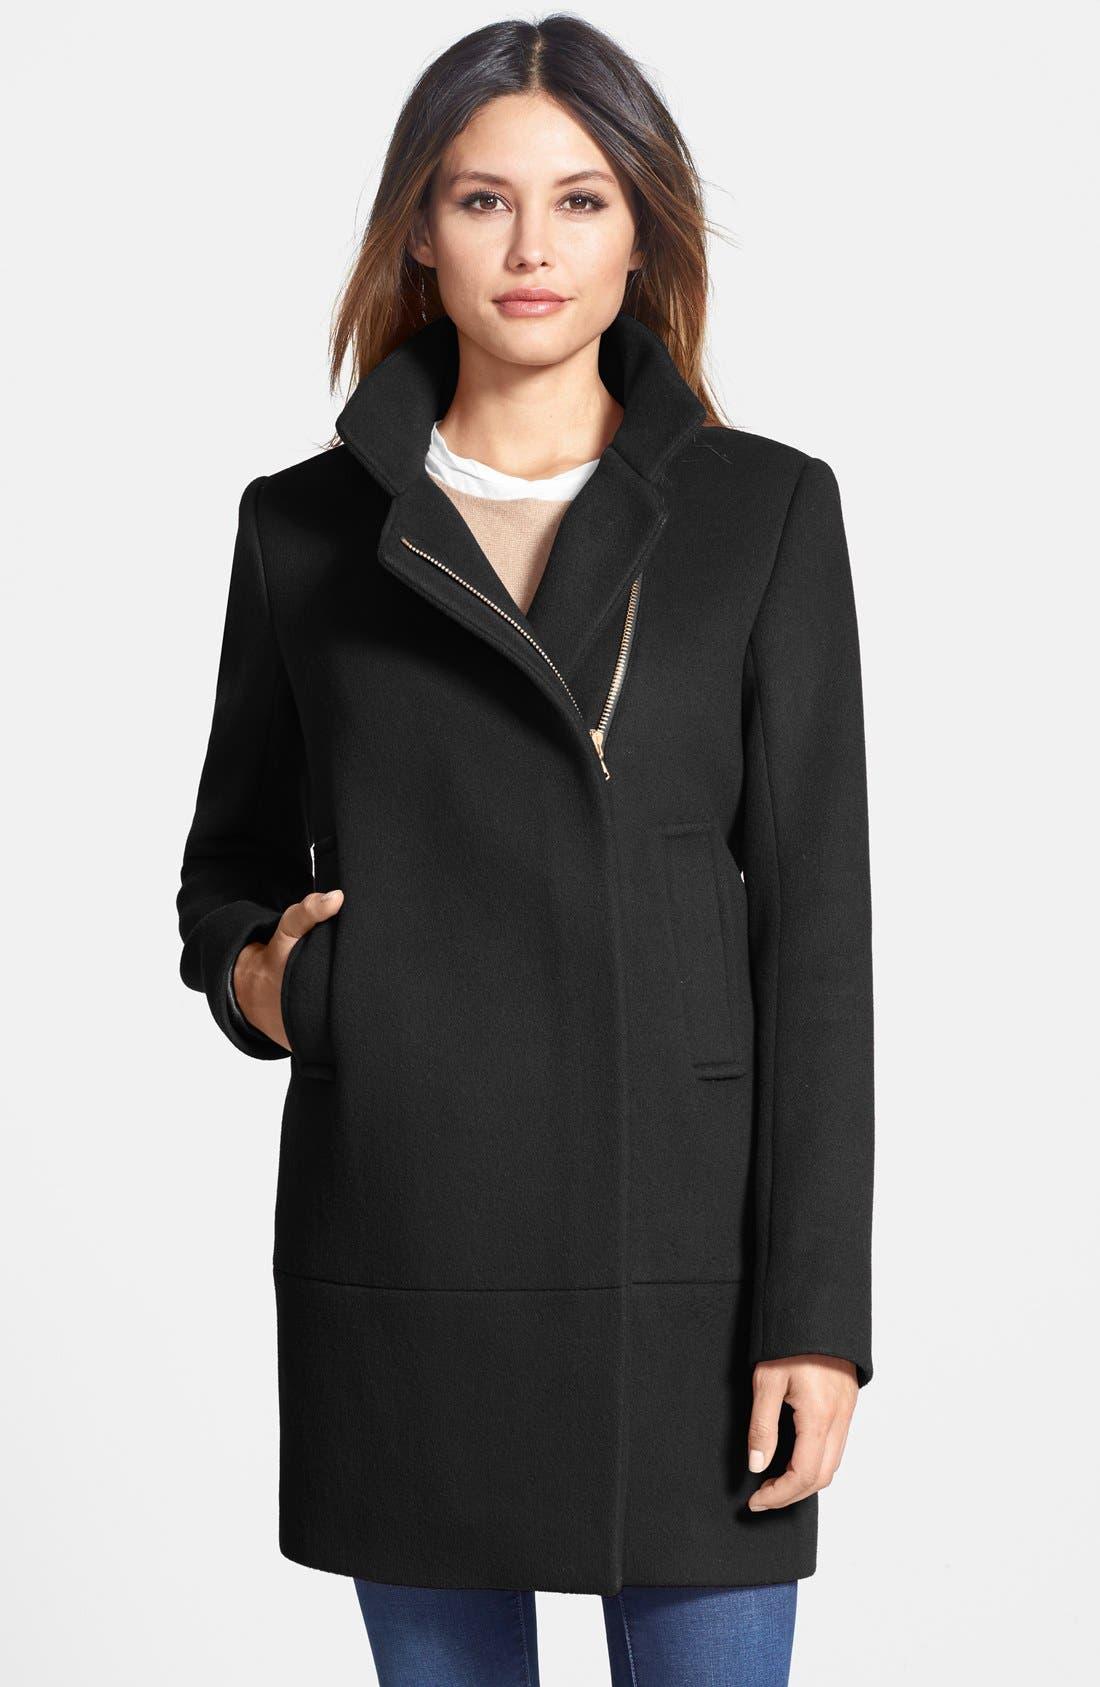 Main Image - Diane von Furstenberg 'Lauren' Asymmetrical Zip Wool Blend Coat